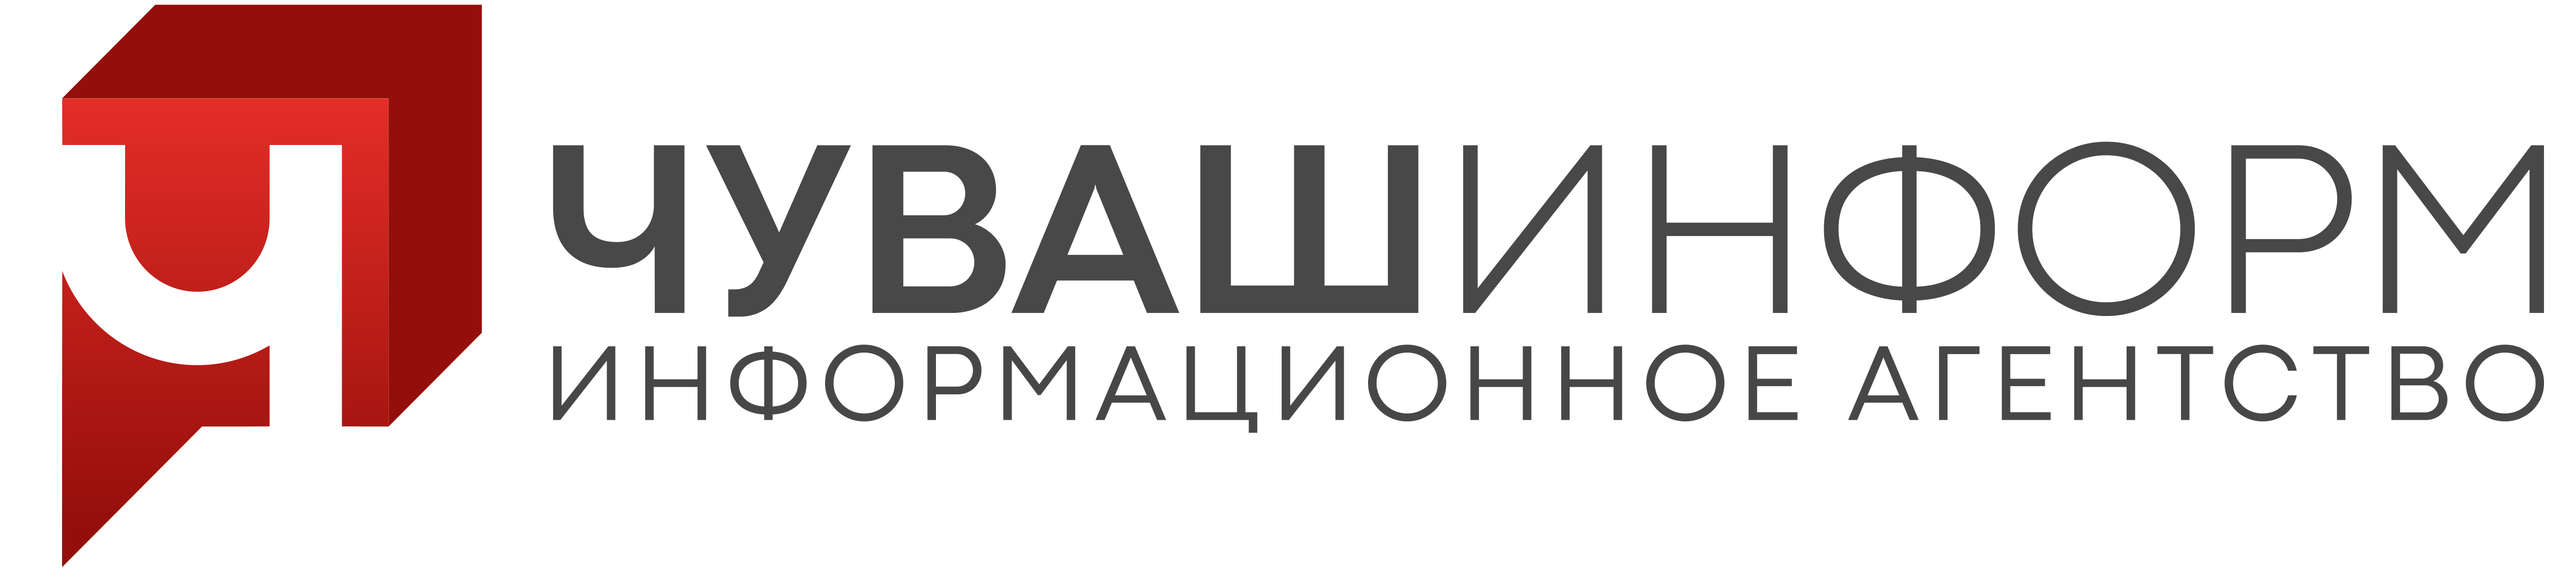 Чувашинформ.рф